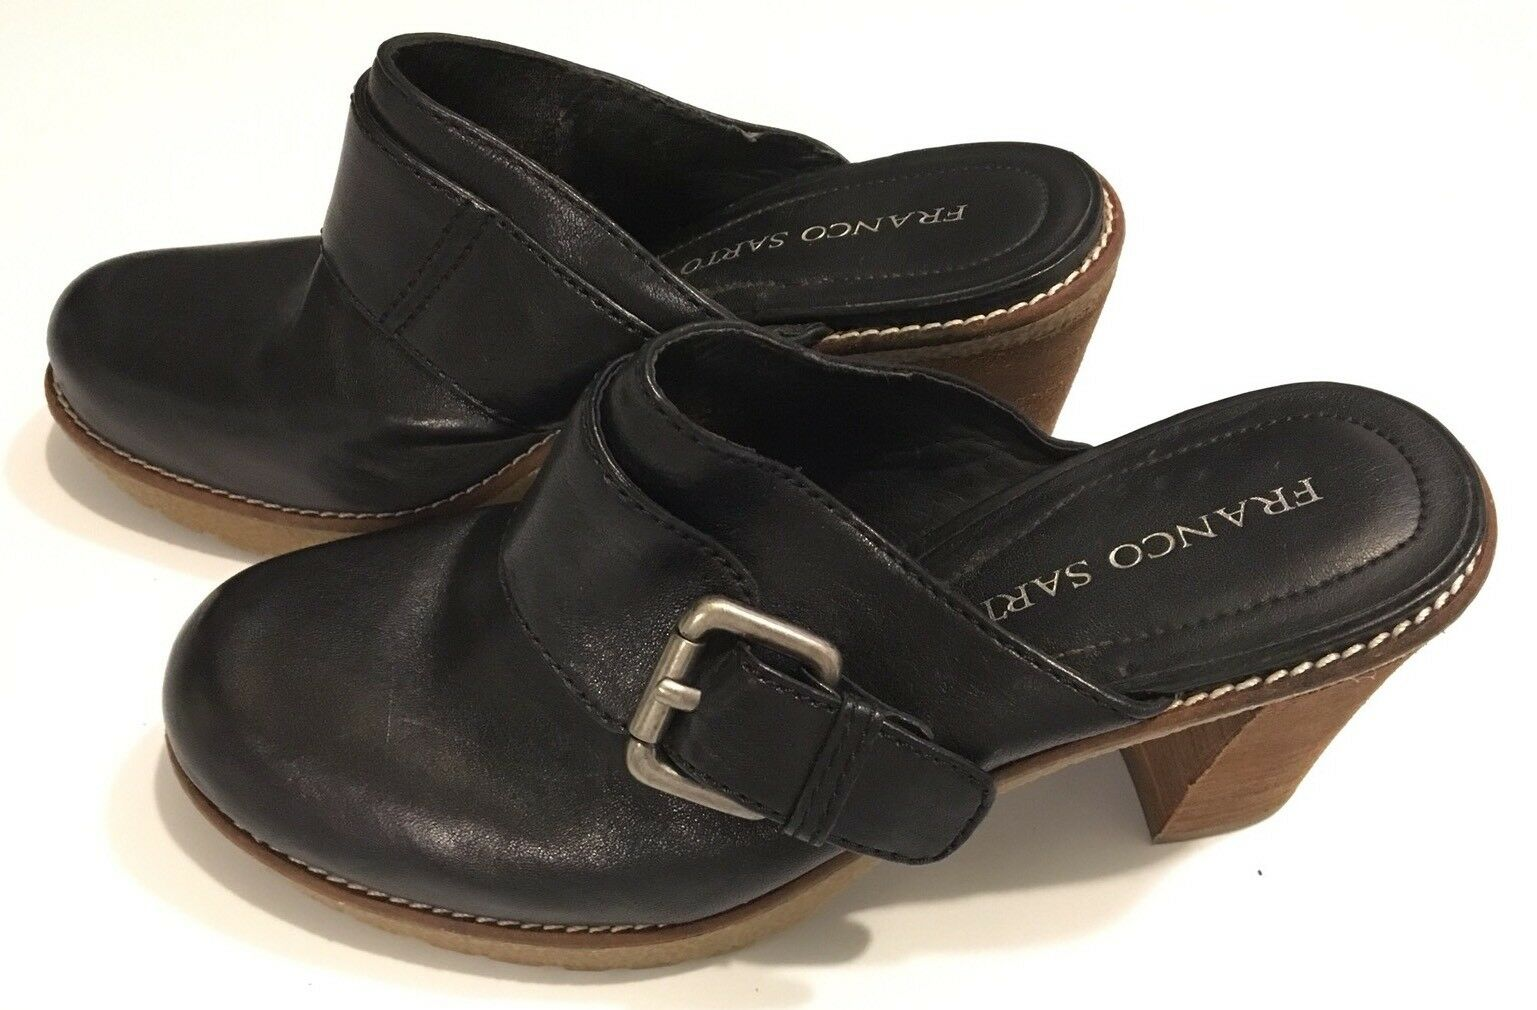 Franco Sarto Women's 8.5 Black Leather Platform Buckle Shoes Block Heels Clogs Buckle Platform f1ce1a